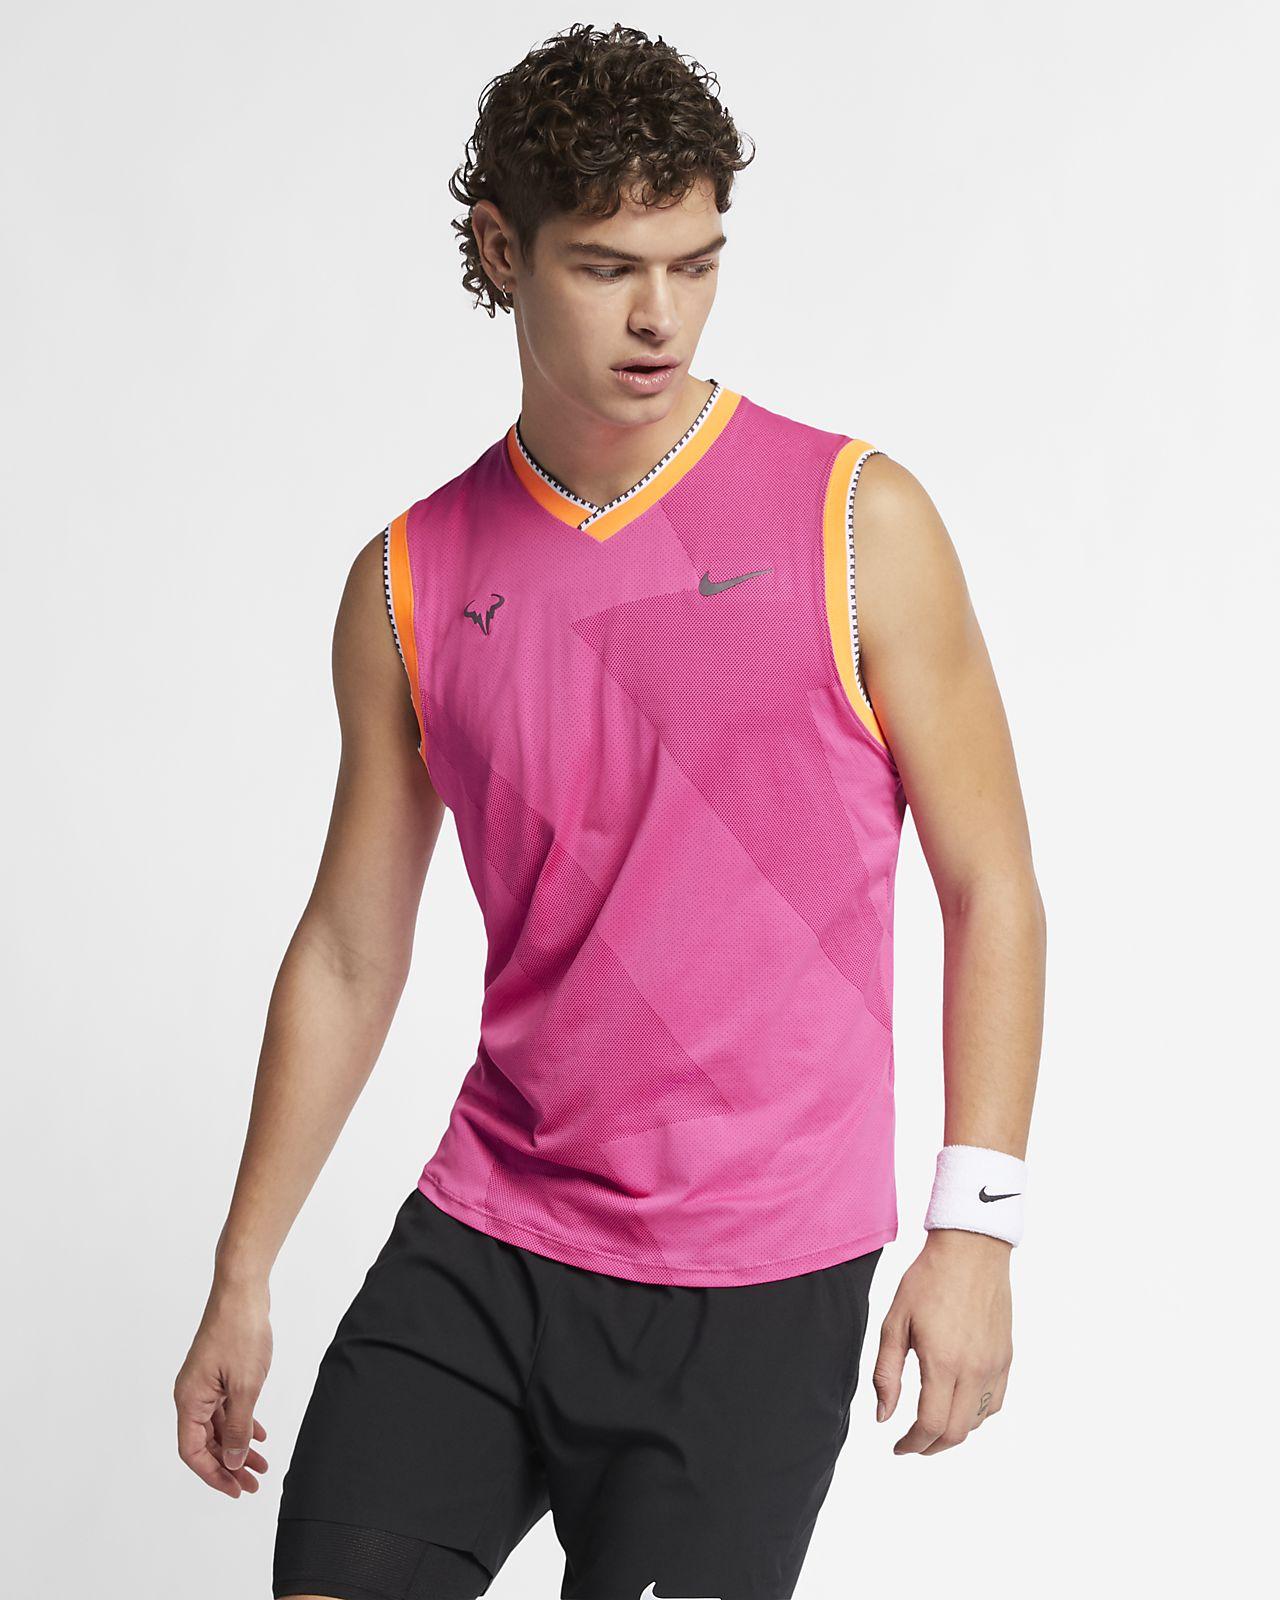 Prenda para la parte superior de tenis sin mangas para hombre NikeCourt AeroReact Rafa